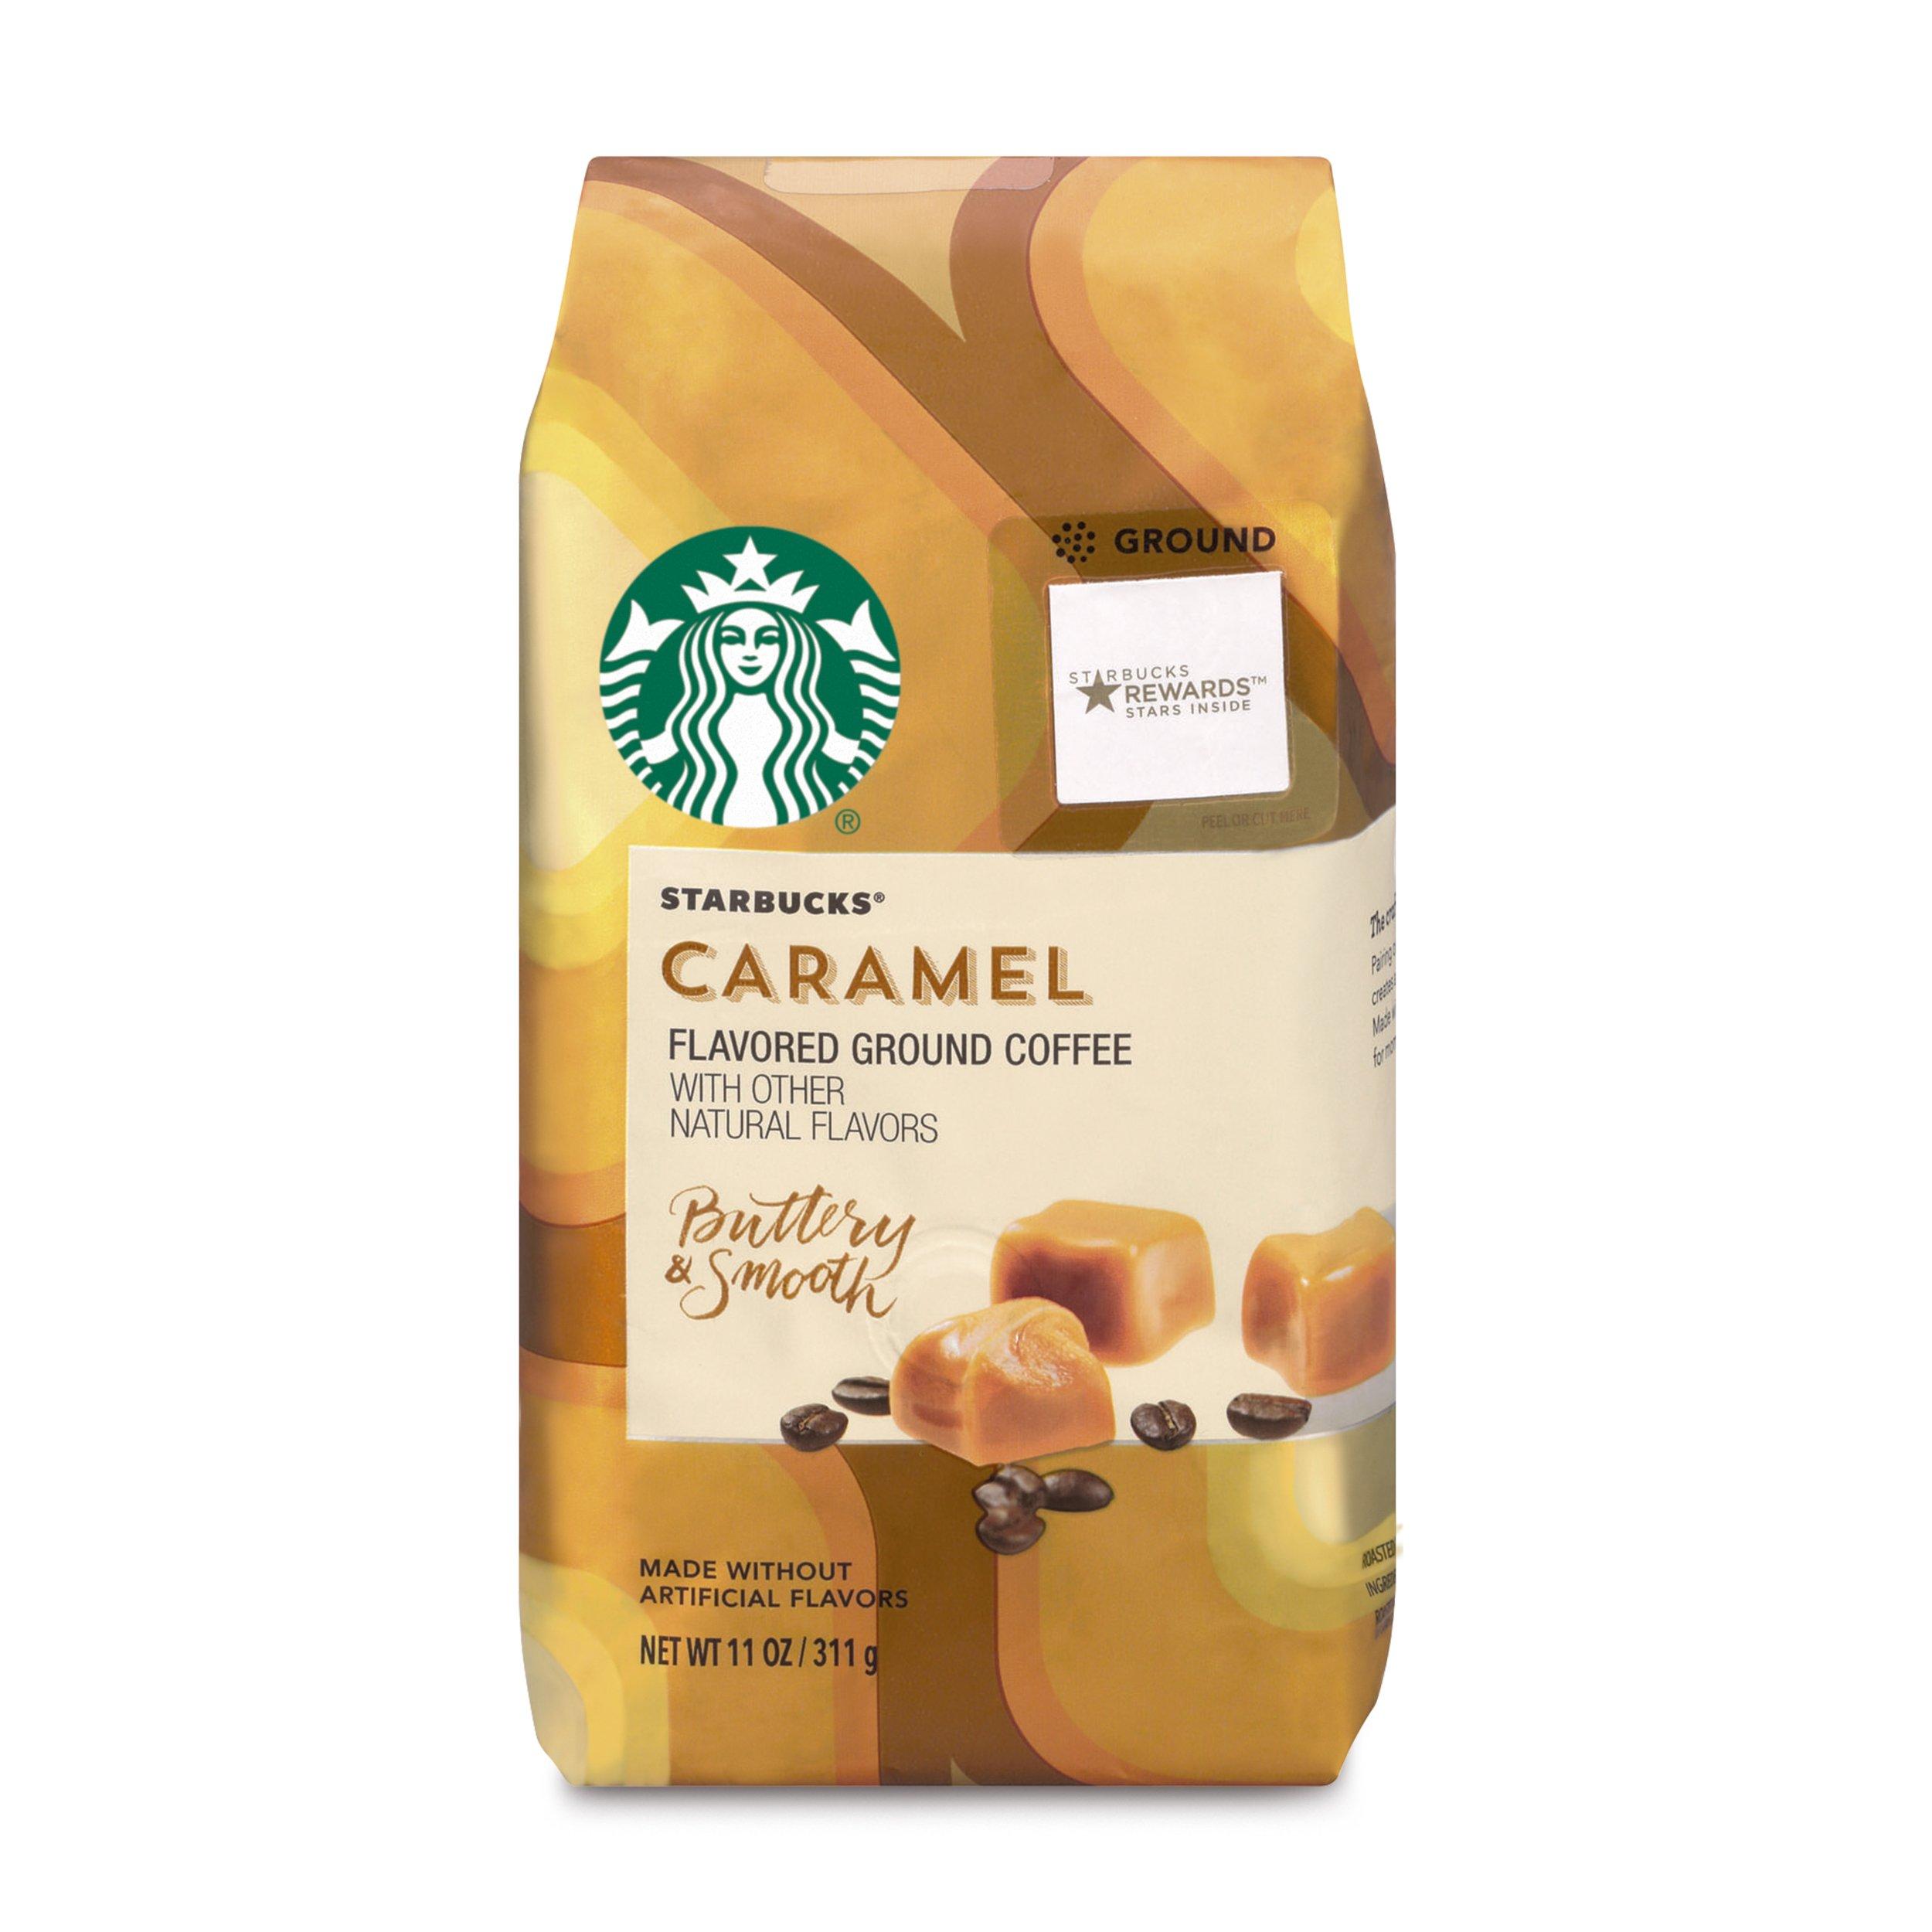 Starbucks Caramel Flavored Medium Roast Ground Coffee, 11-Ounce Bag (Pack of 6)